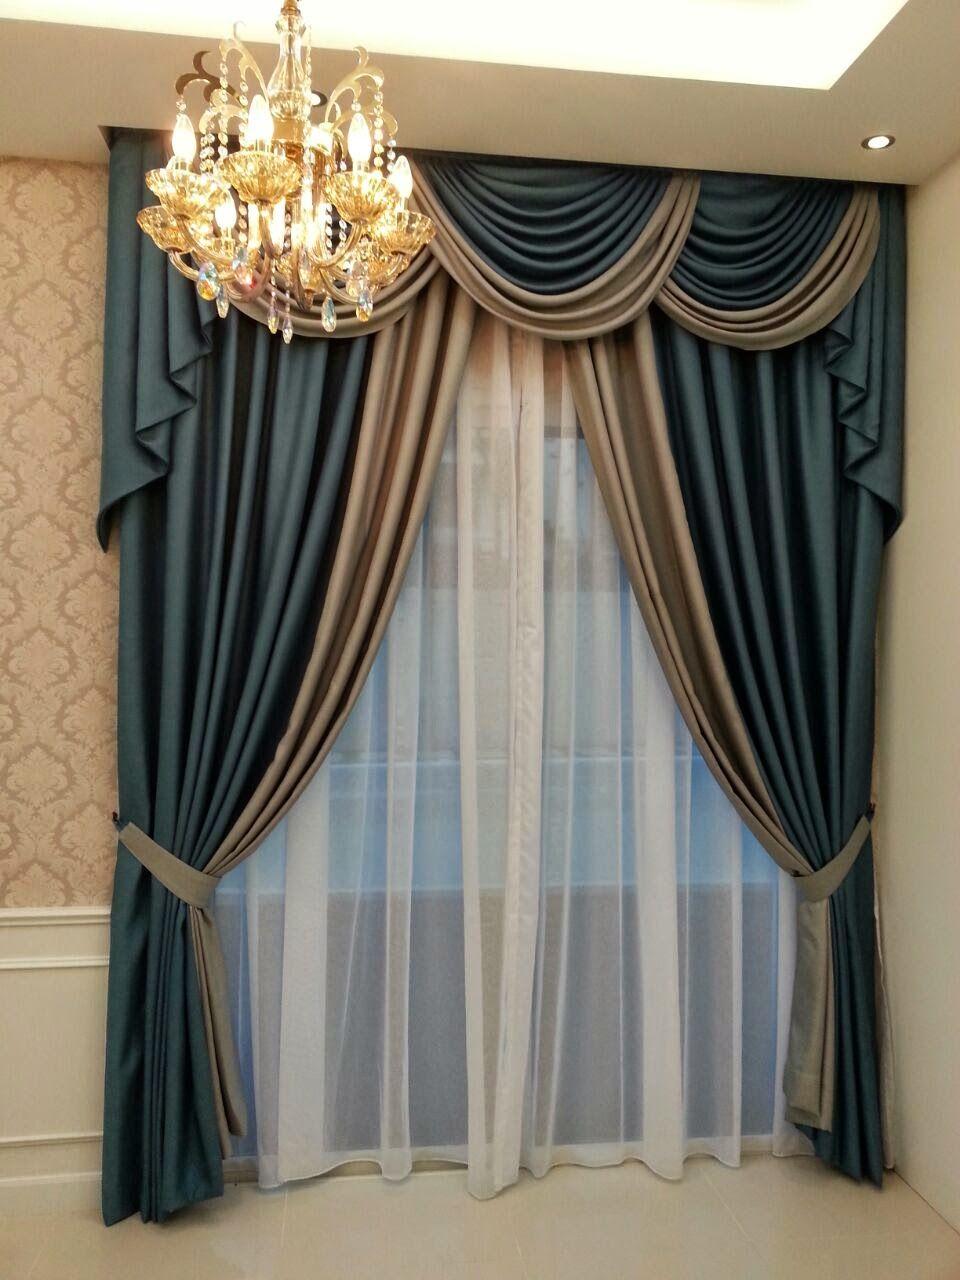 Imgwag пикс curtains pinterest